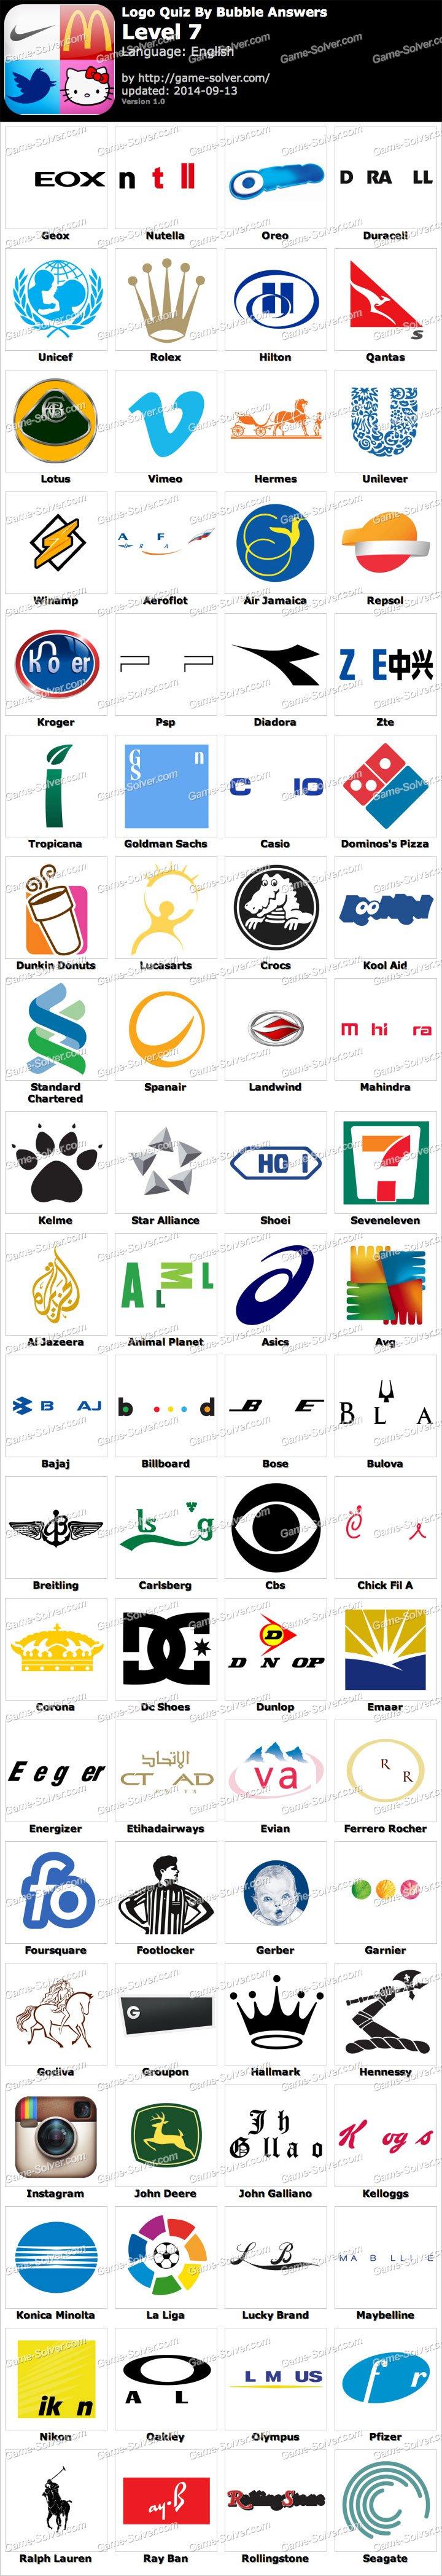 Logos Answers Level 7 : logos, answers, level, Bubble, Answers, Level, Quiz,, Answers,